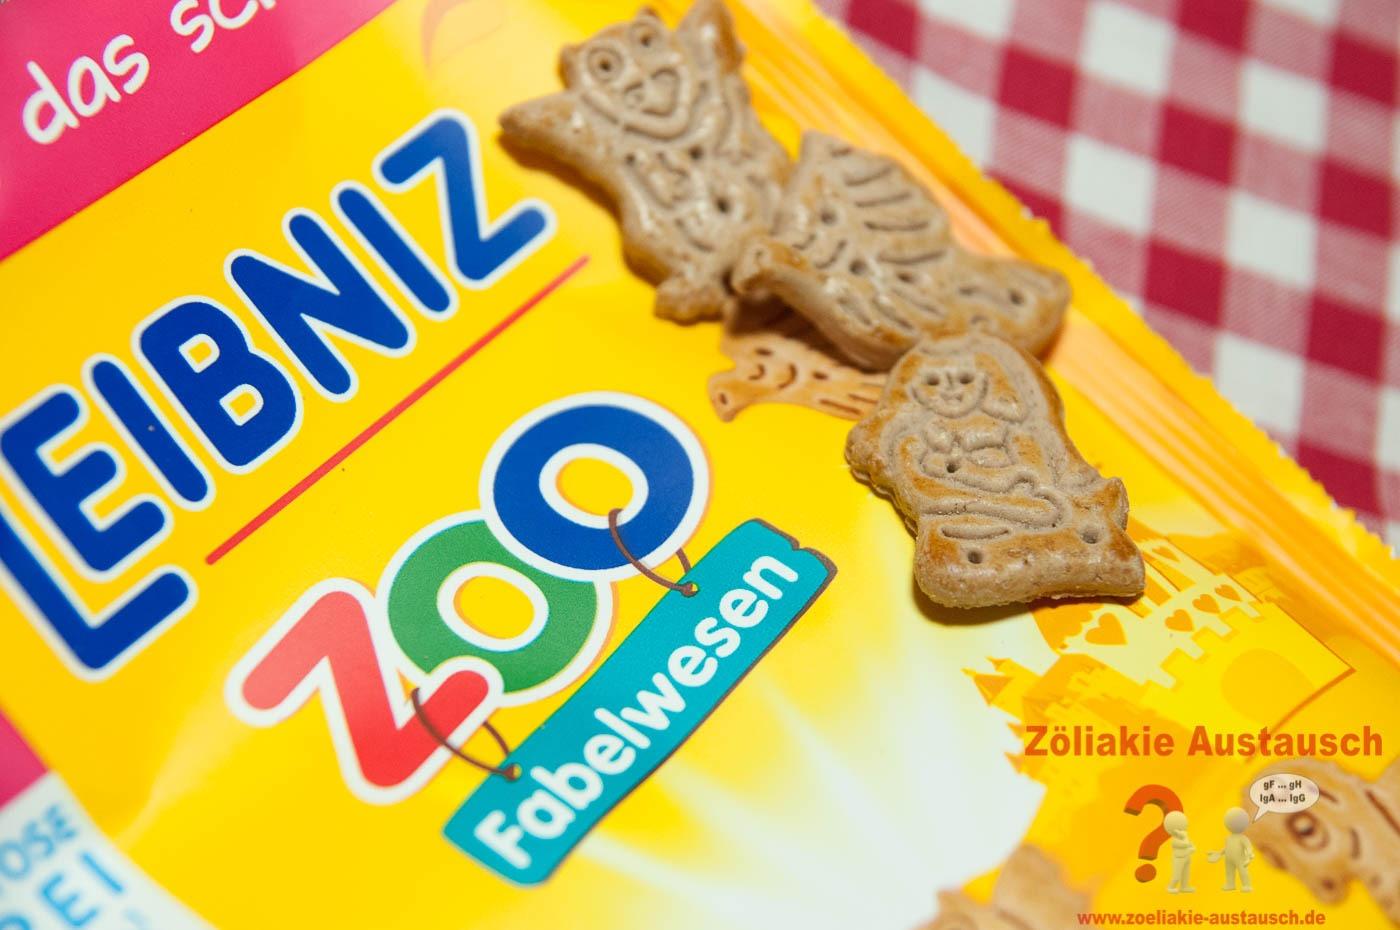 Zoeliakie_Austausch_Leibniz_Kekse-019